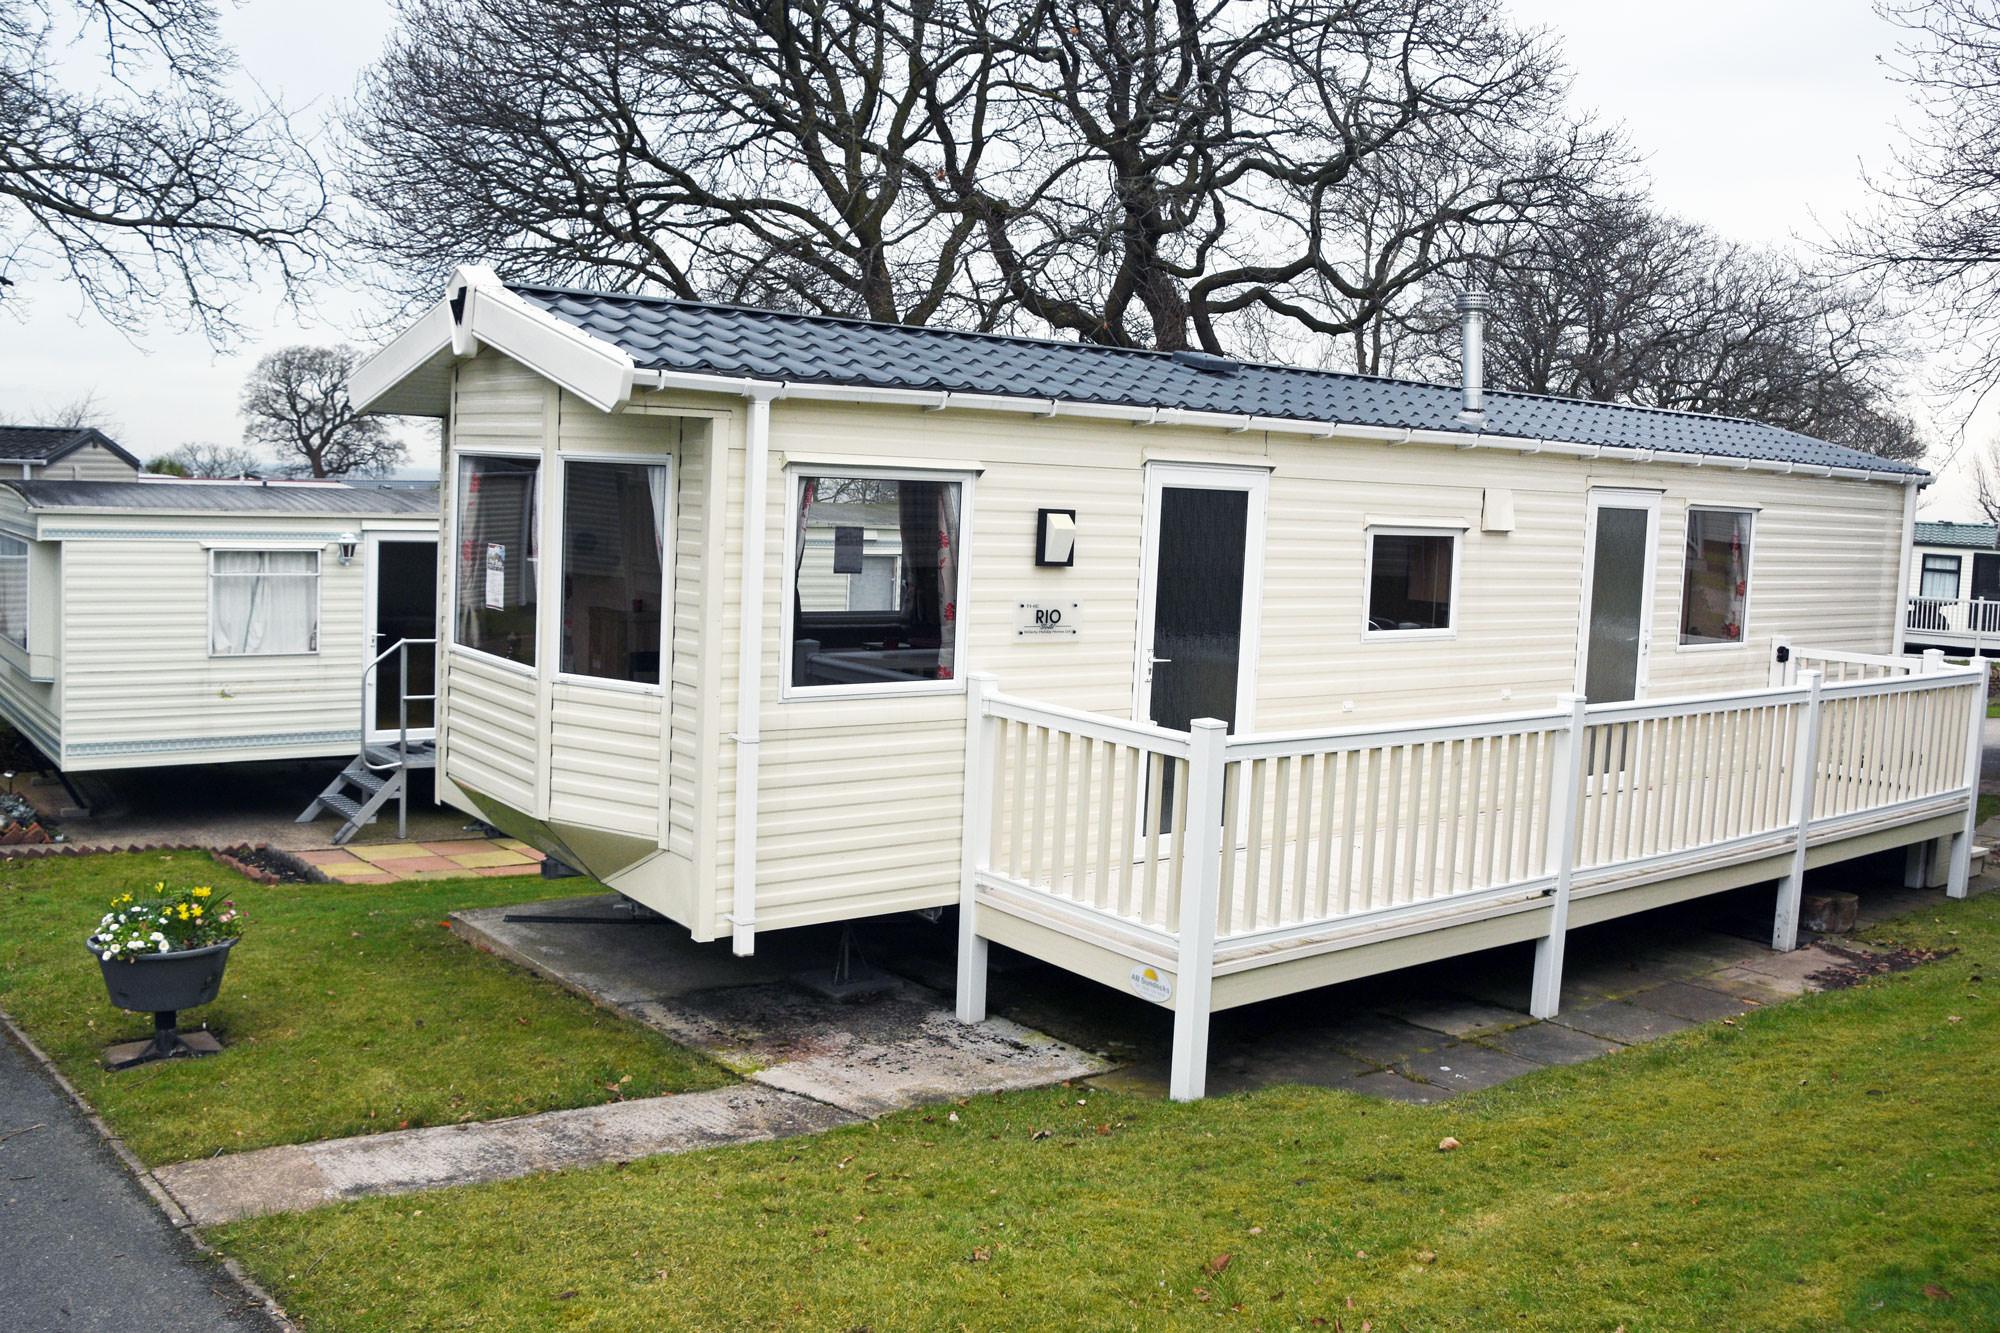 Caravan for Sale in North Wales